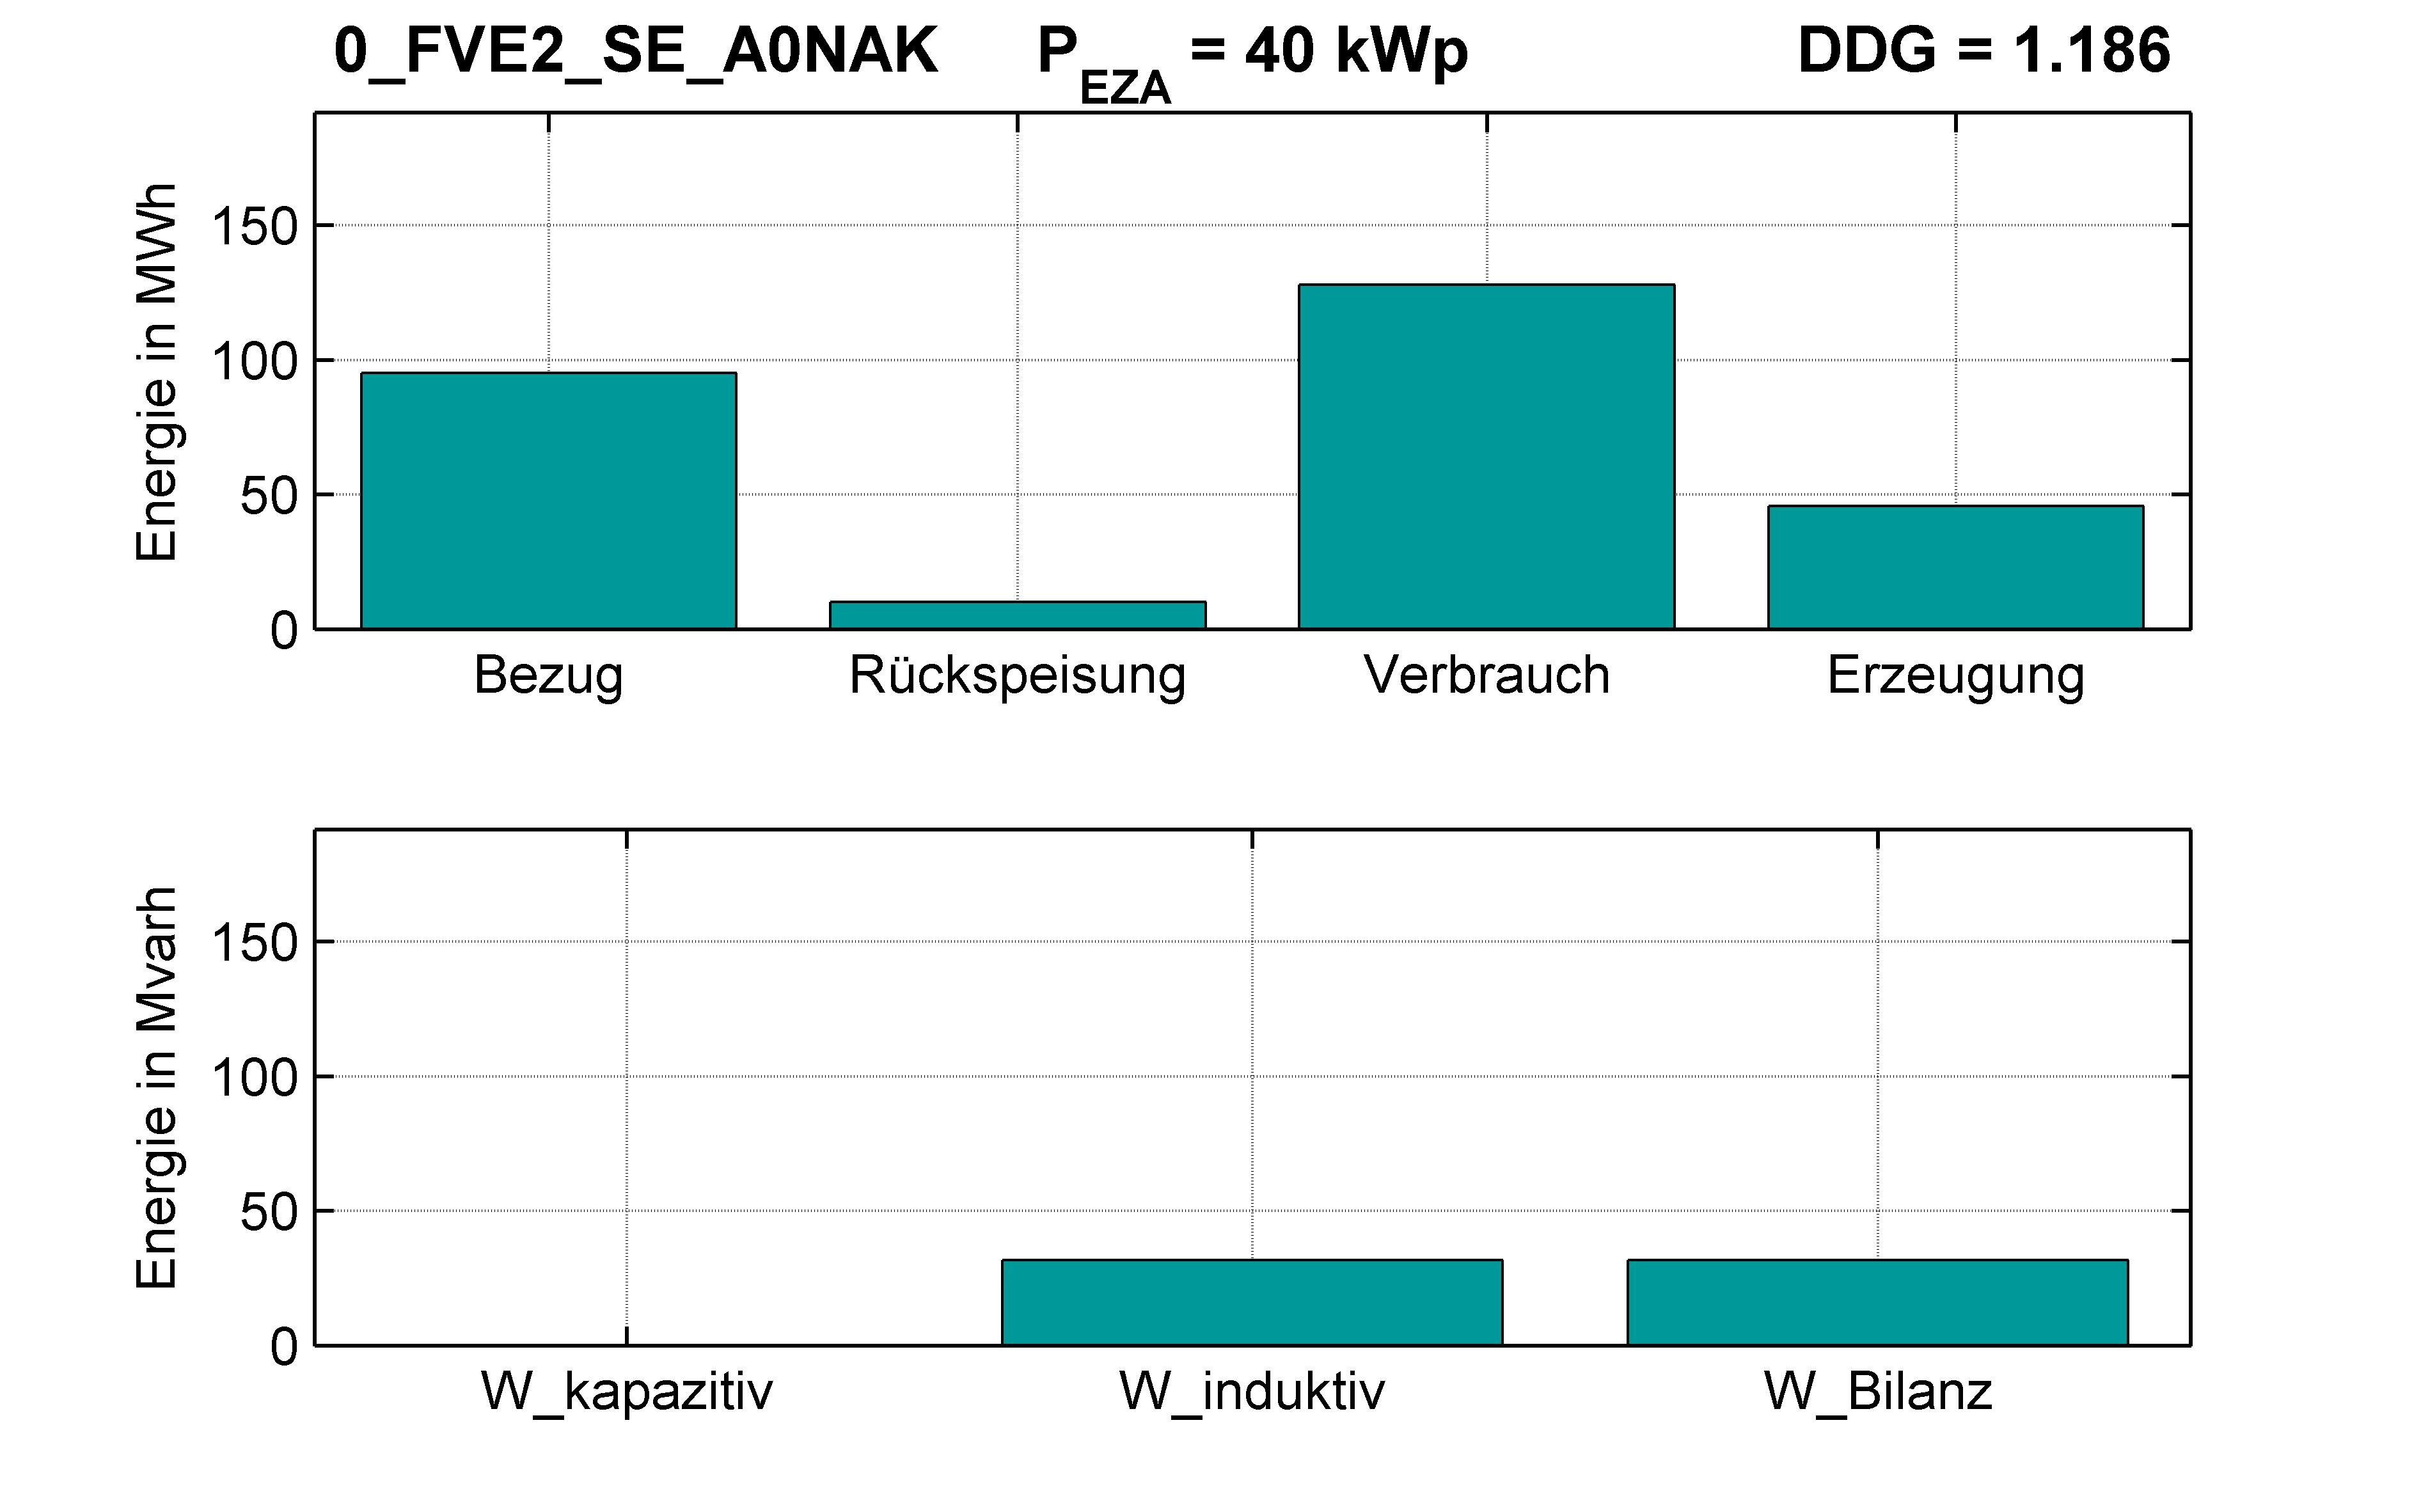 FVE2 | RONT (SE) A0NAK | PQ-Bilanz